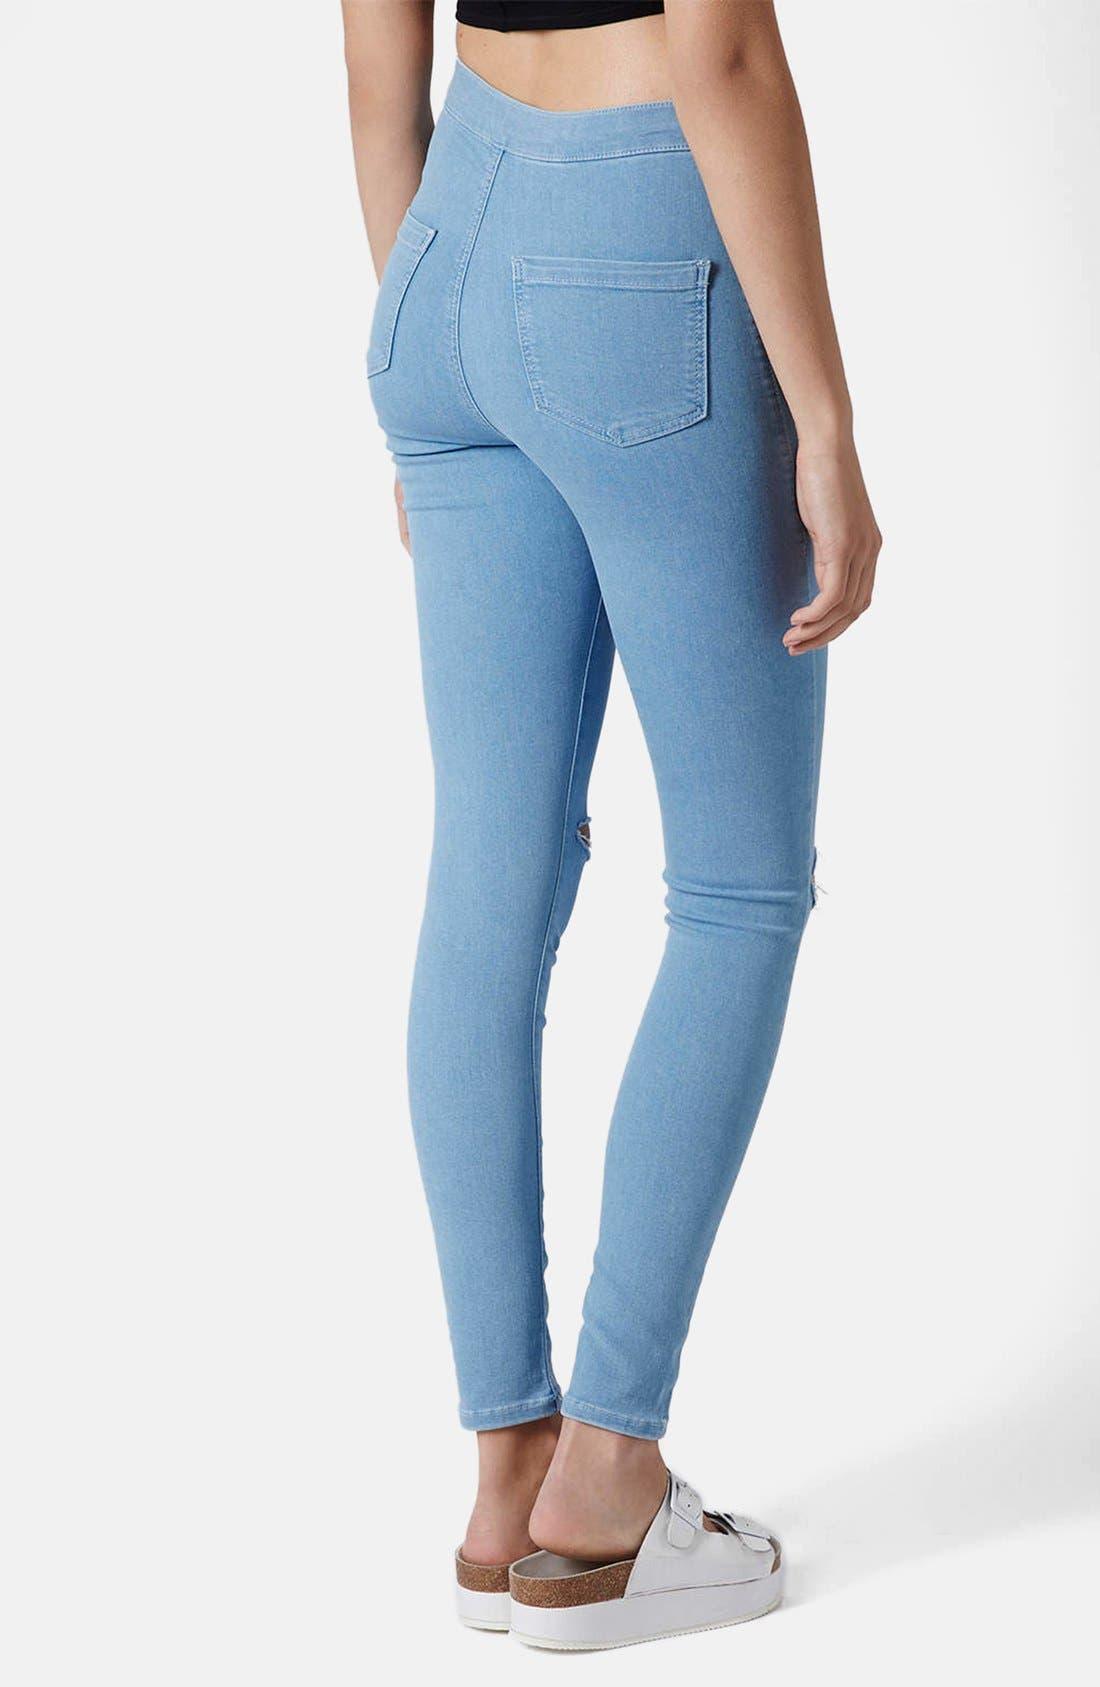 Alternate Image 2  - Topshop Moto 'Joni' Ripped High Rise Skinny Jeans (Light Denim) (Short)